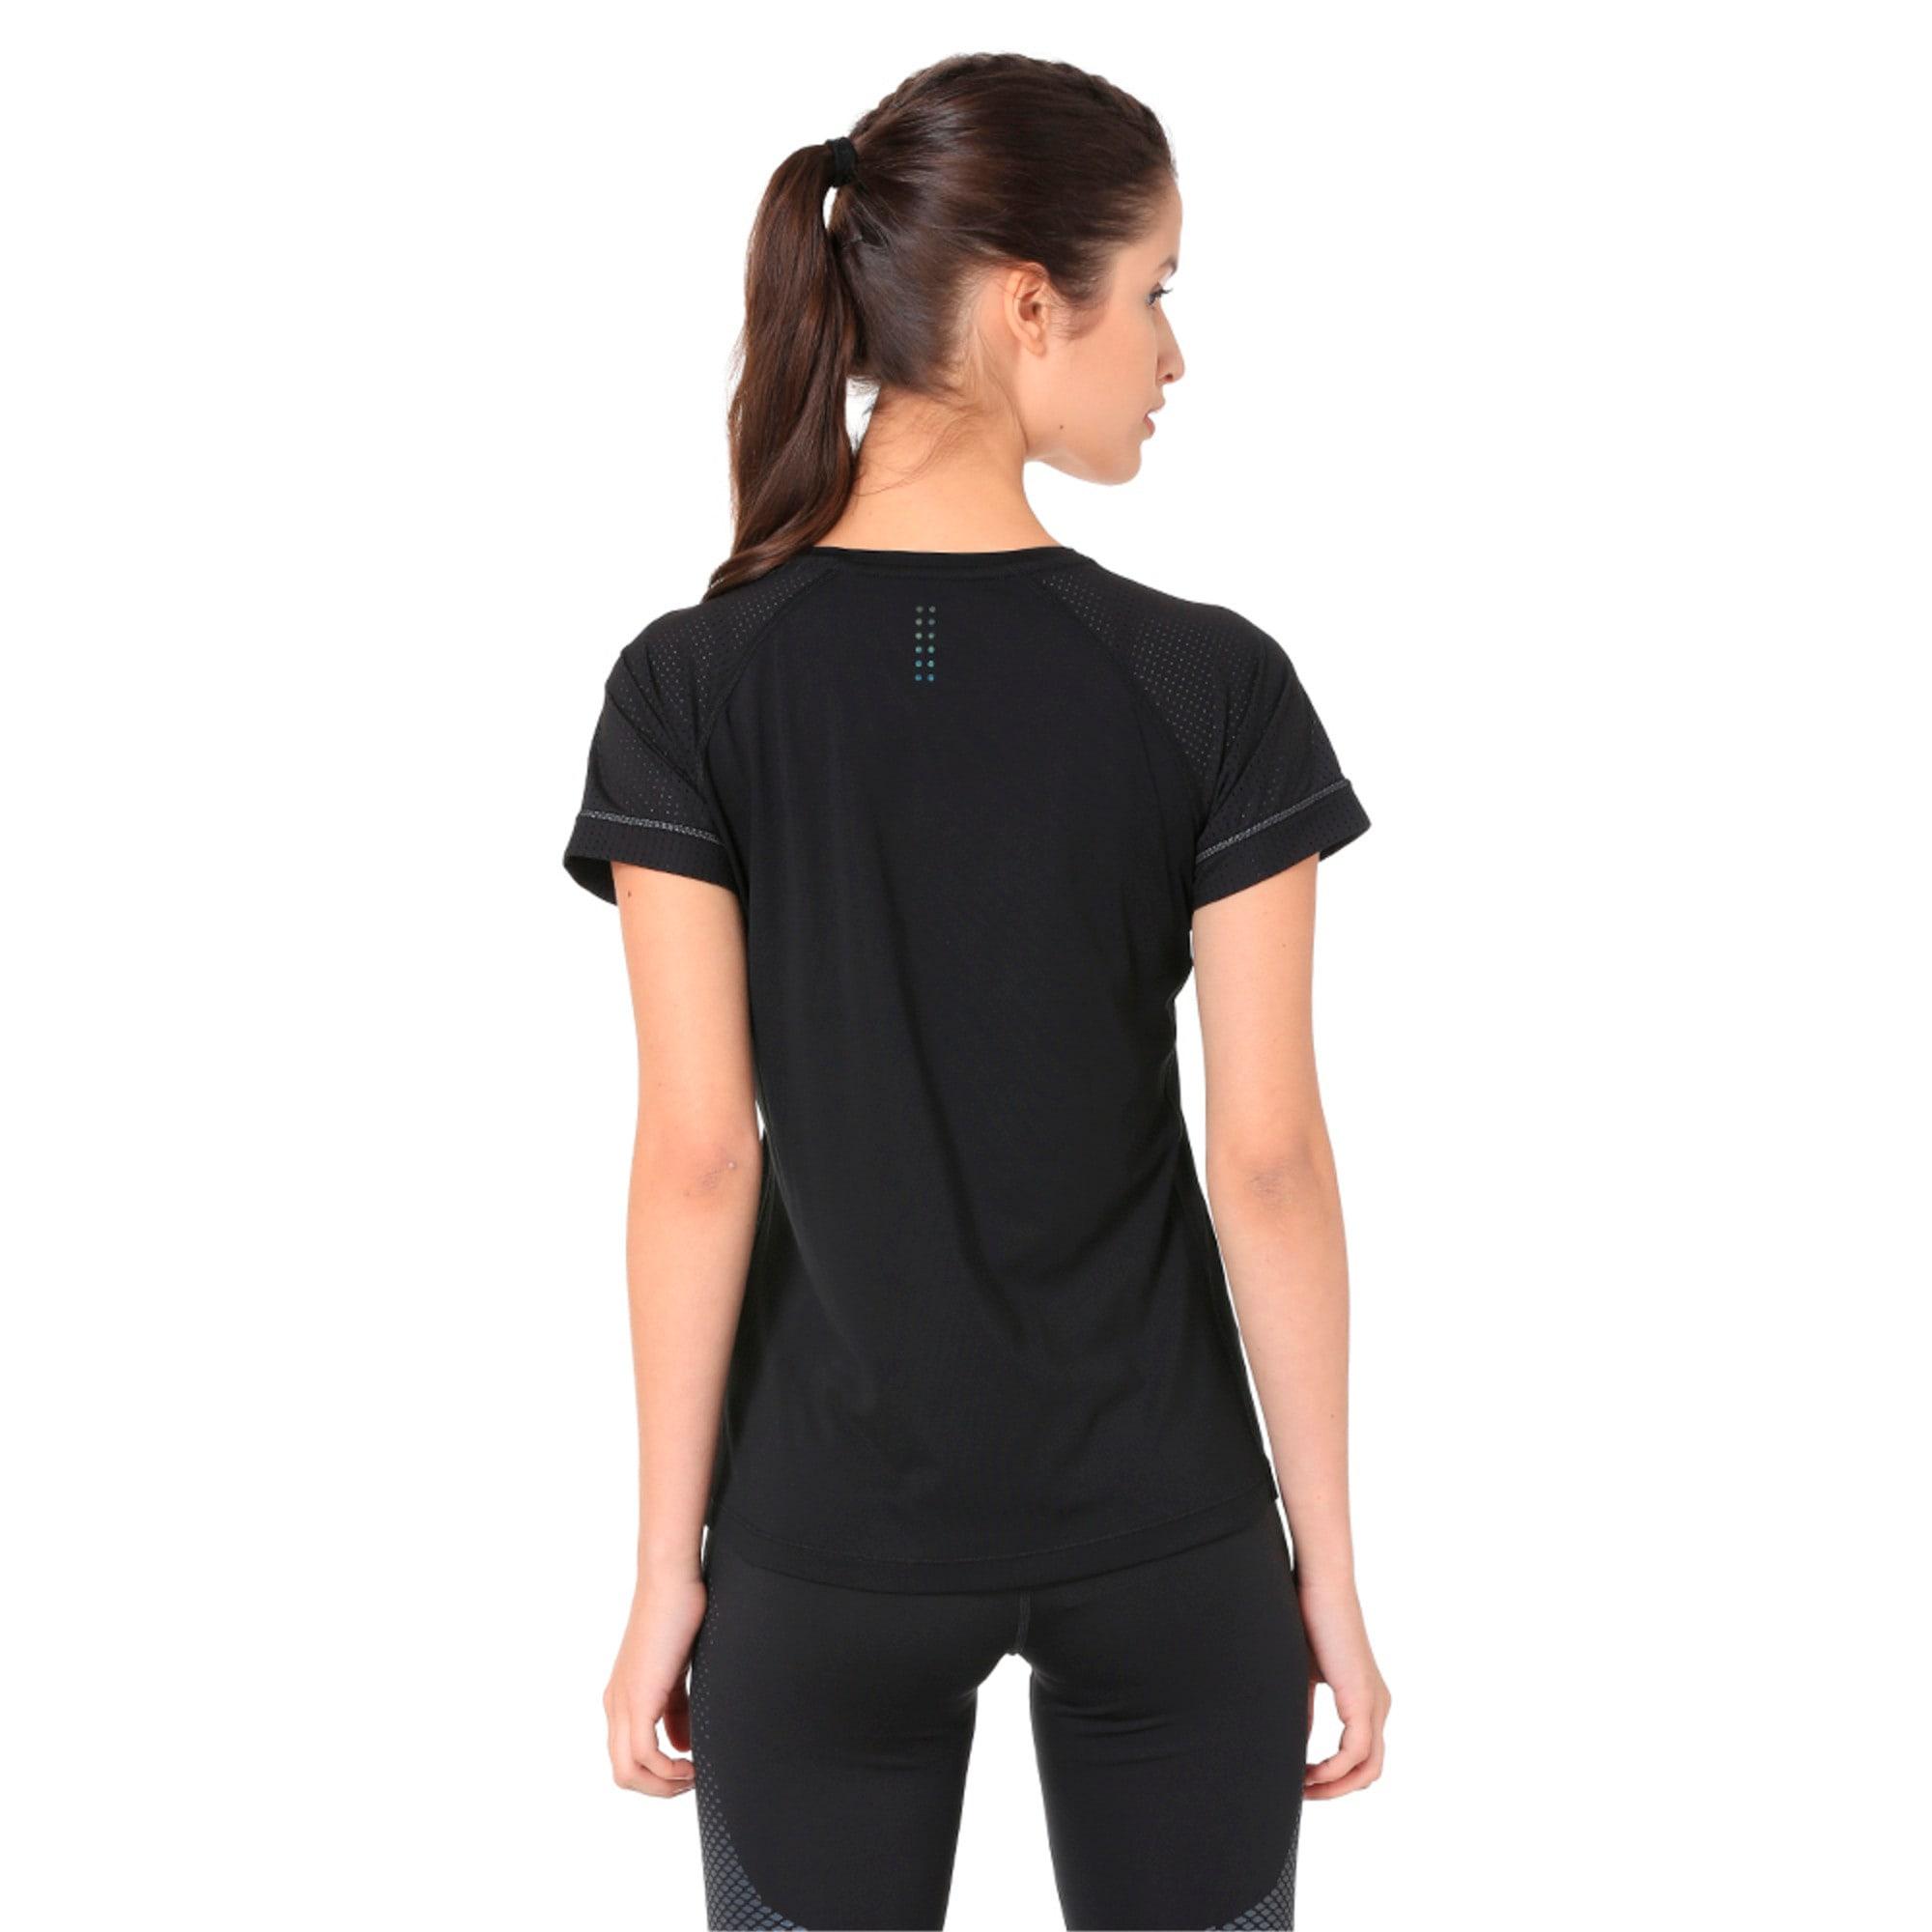 Thumbnail 2 of NightCat Women's Short Sleeve T-Shirt, Puma Black, medium-IND